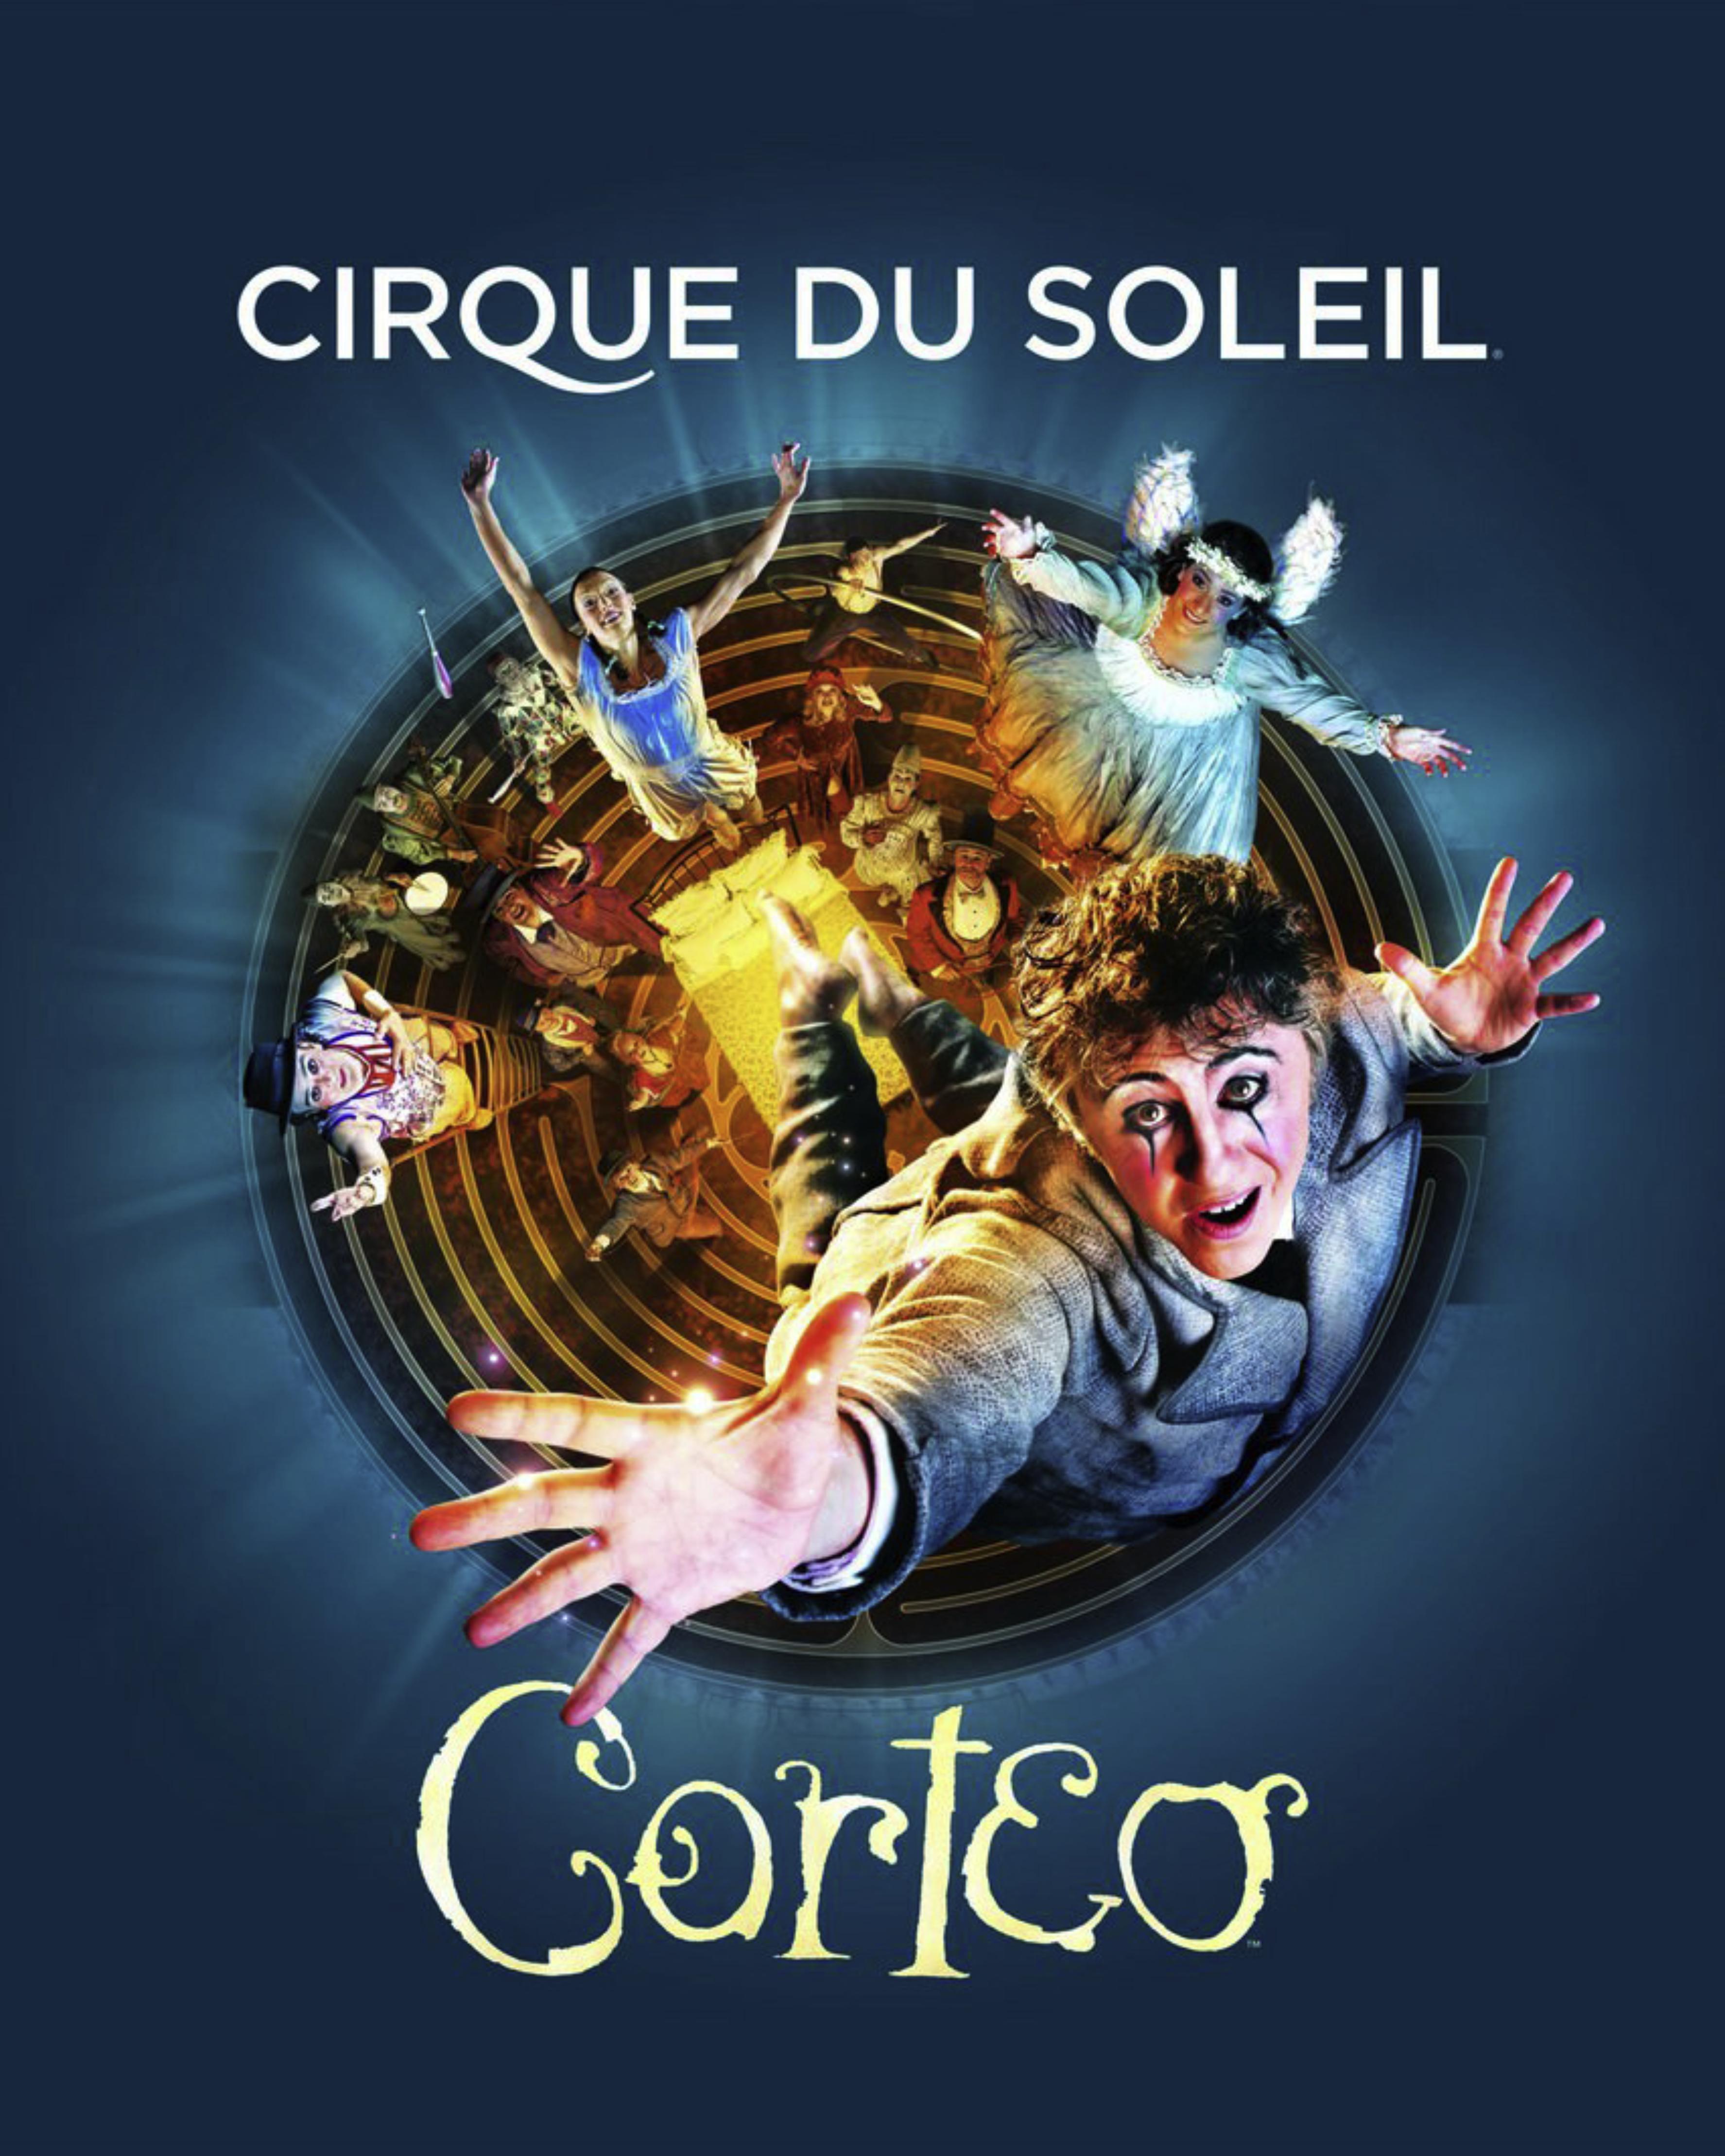 Cirque Du Soleil Corteo Une Comedie Un Regal Un Carnaval Italianno Imaginaire Cirque Du Soleil Cirque Shows